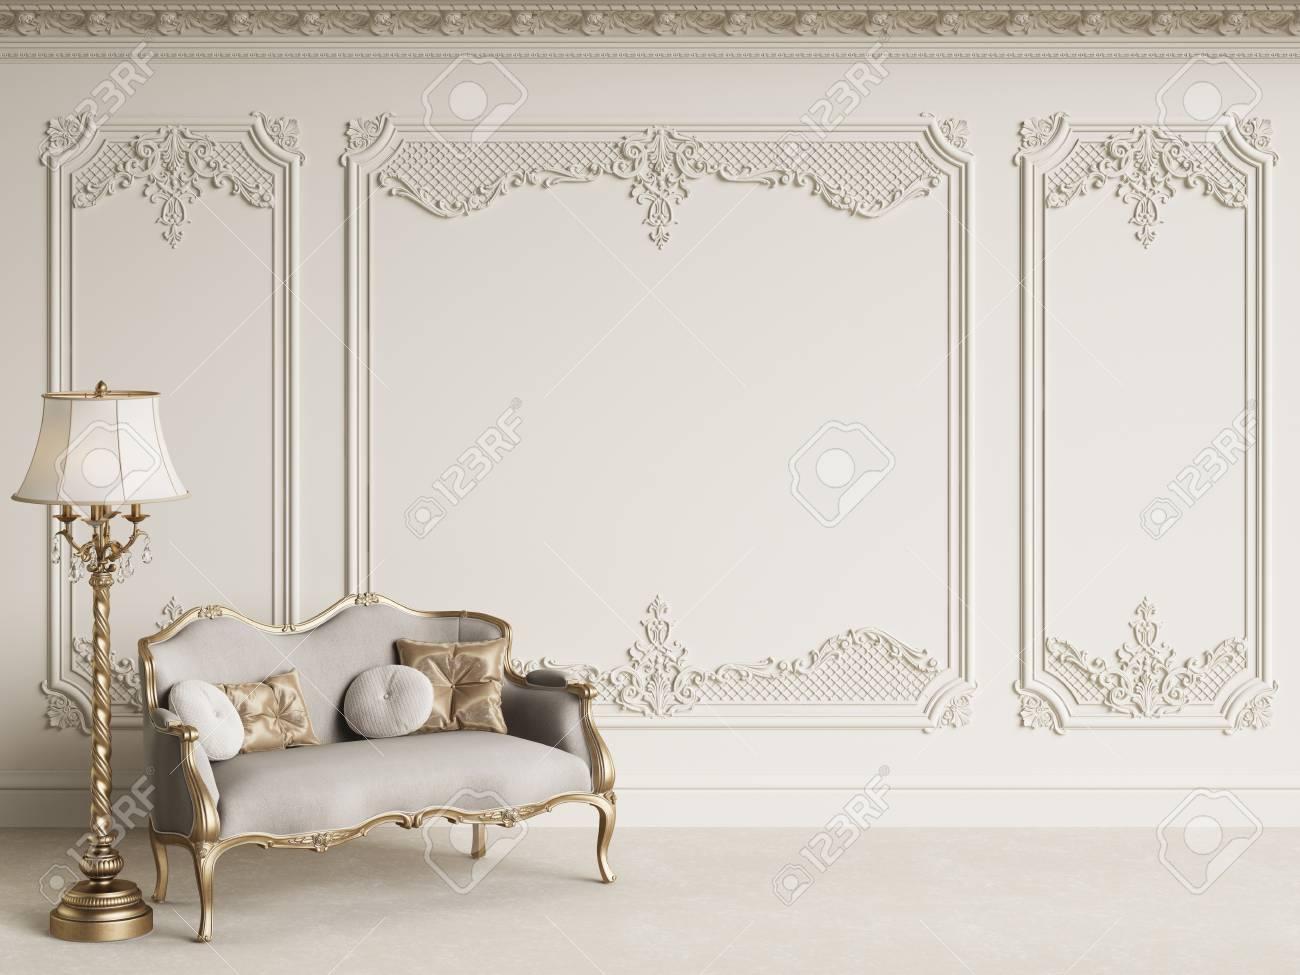 classic furniture in classic interior with copy space white walls rh 123rf com